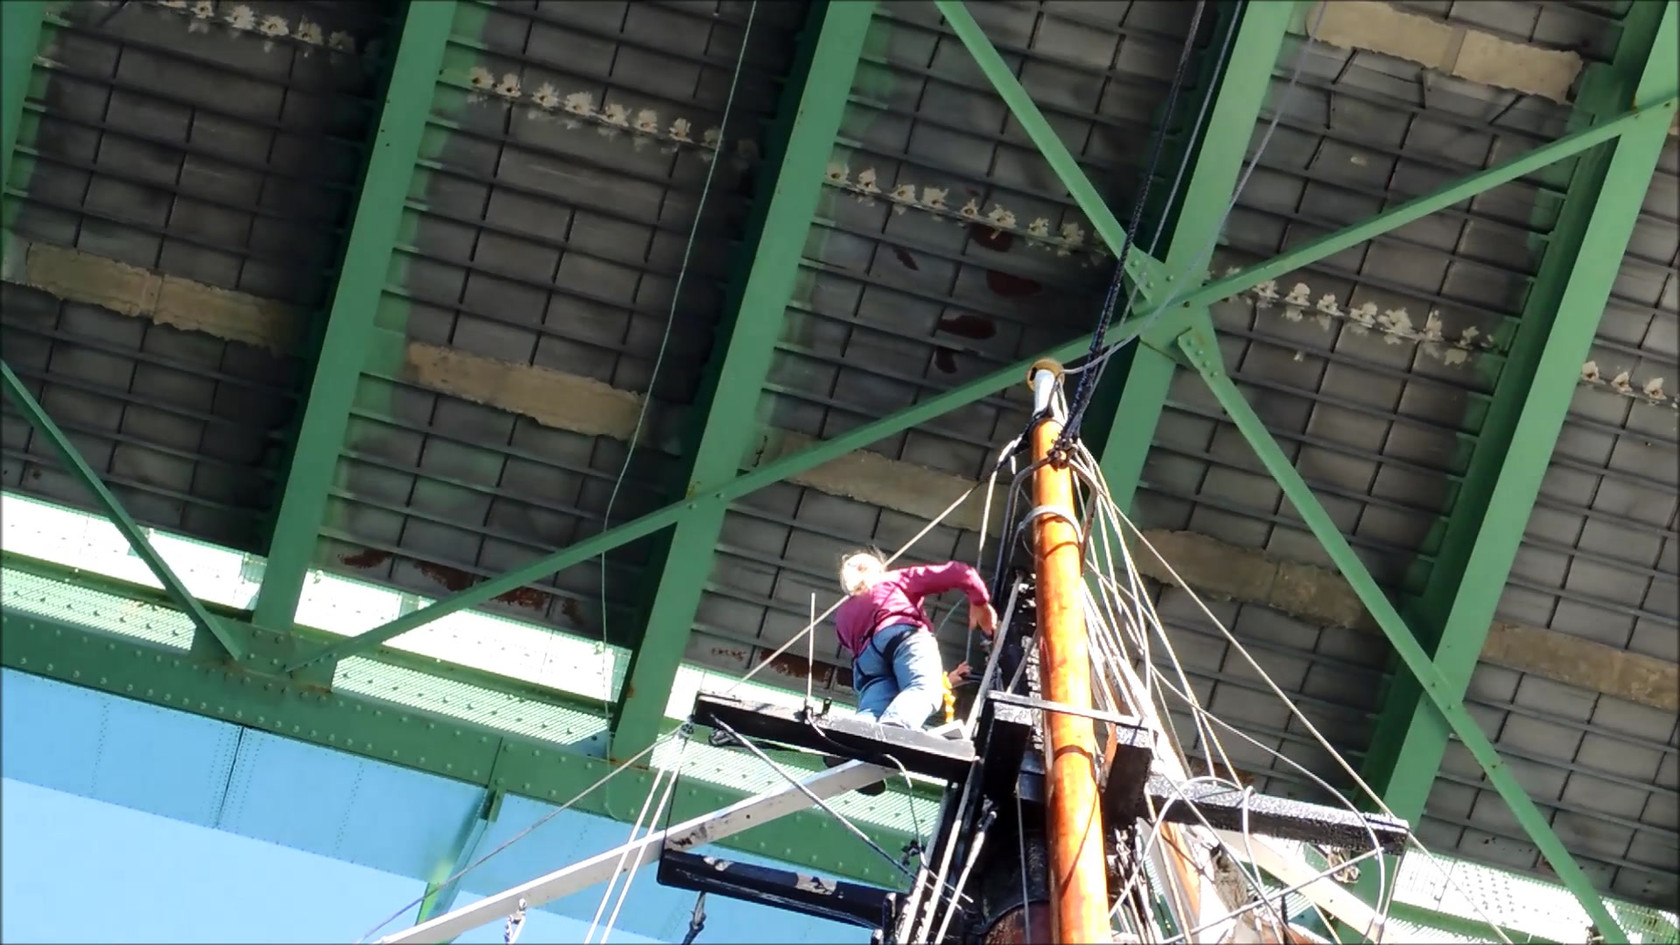 Sailors aloft! Sailing under the Deer Isle Bridge with topmasts lowered. Video: Dick Loehr